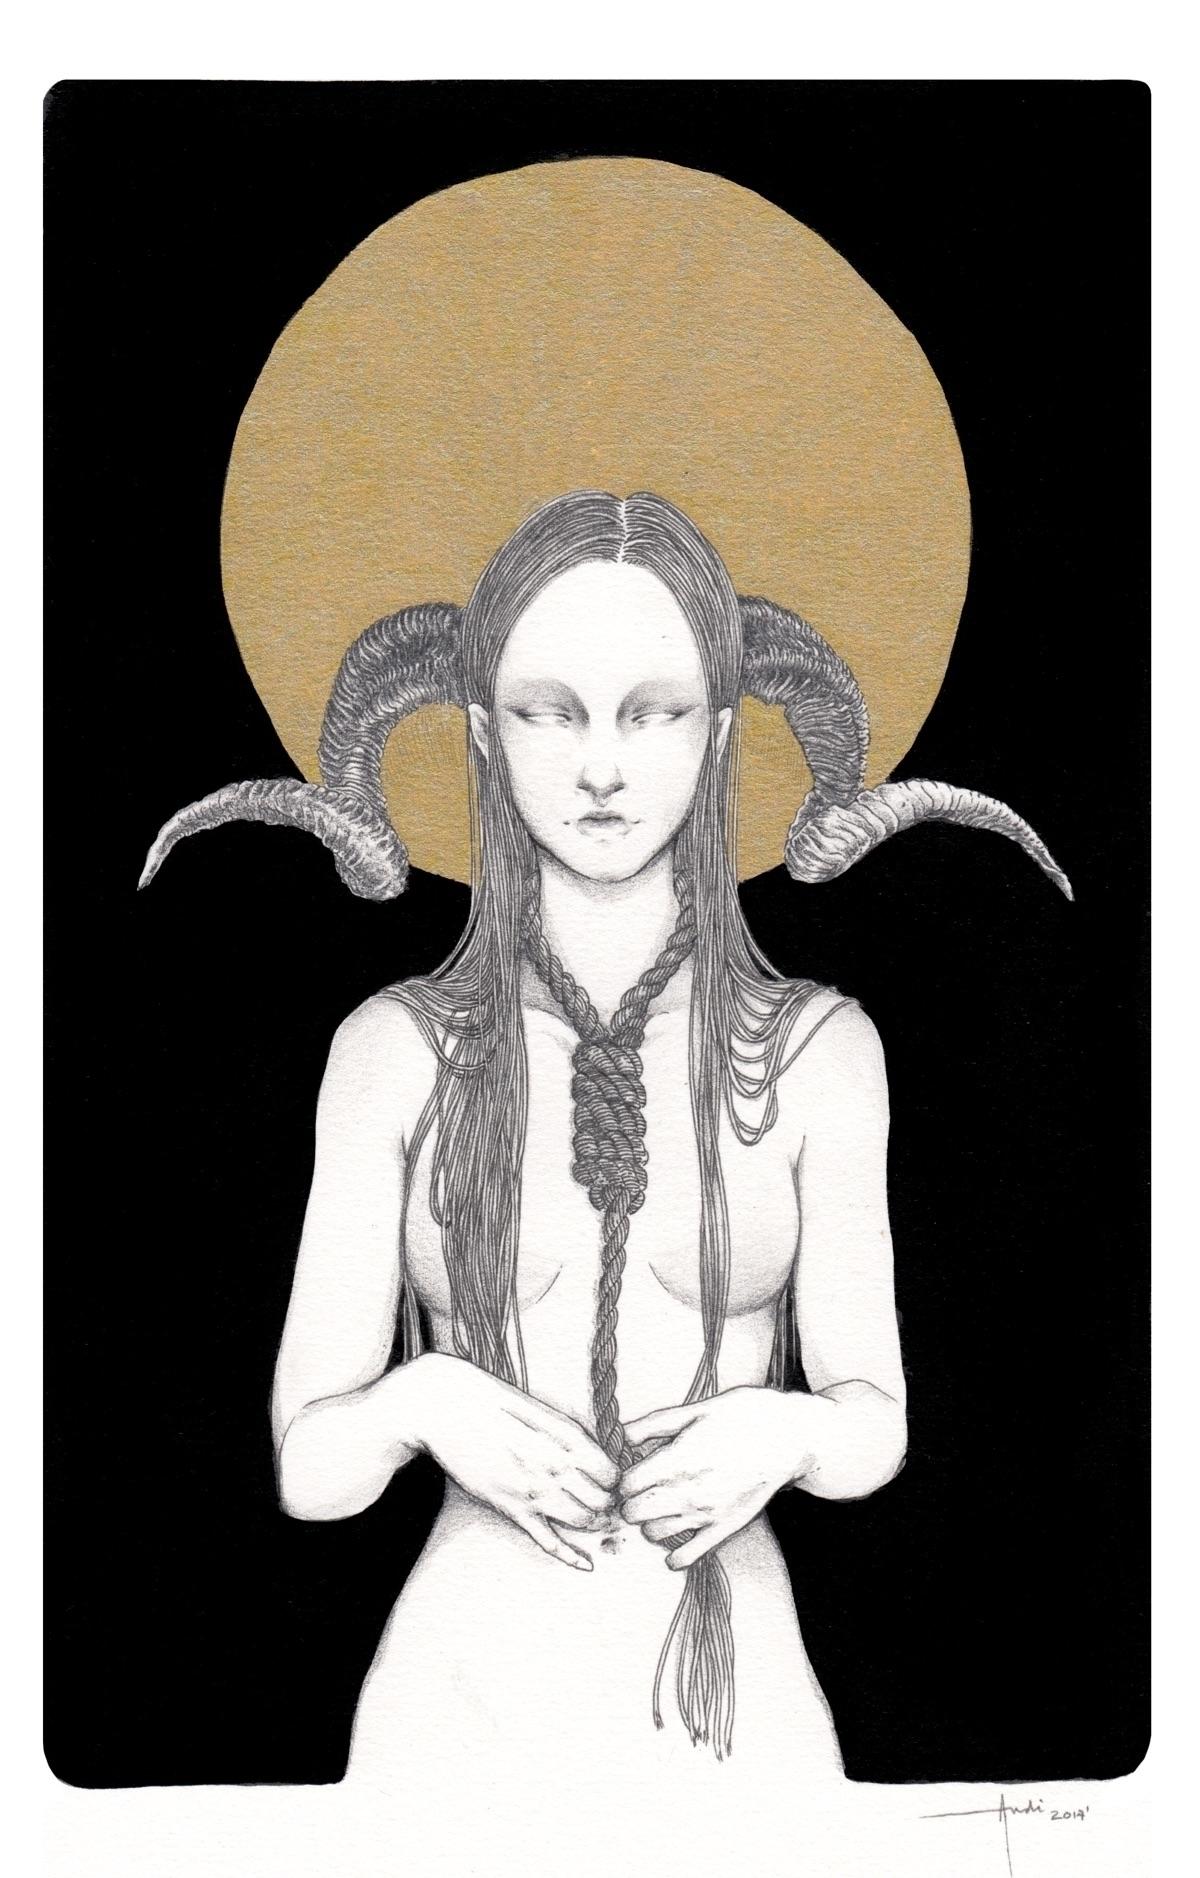 'Condemnation - andisoto, illustrator - andimacka   ello